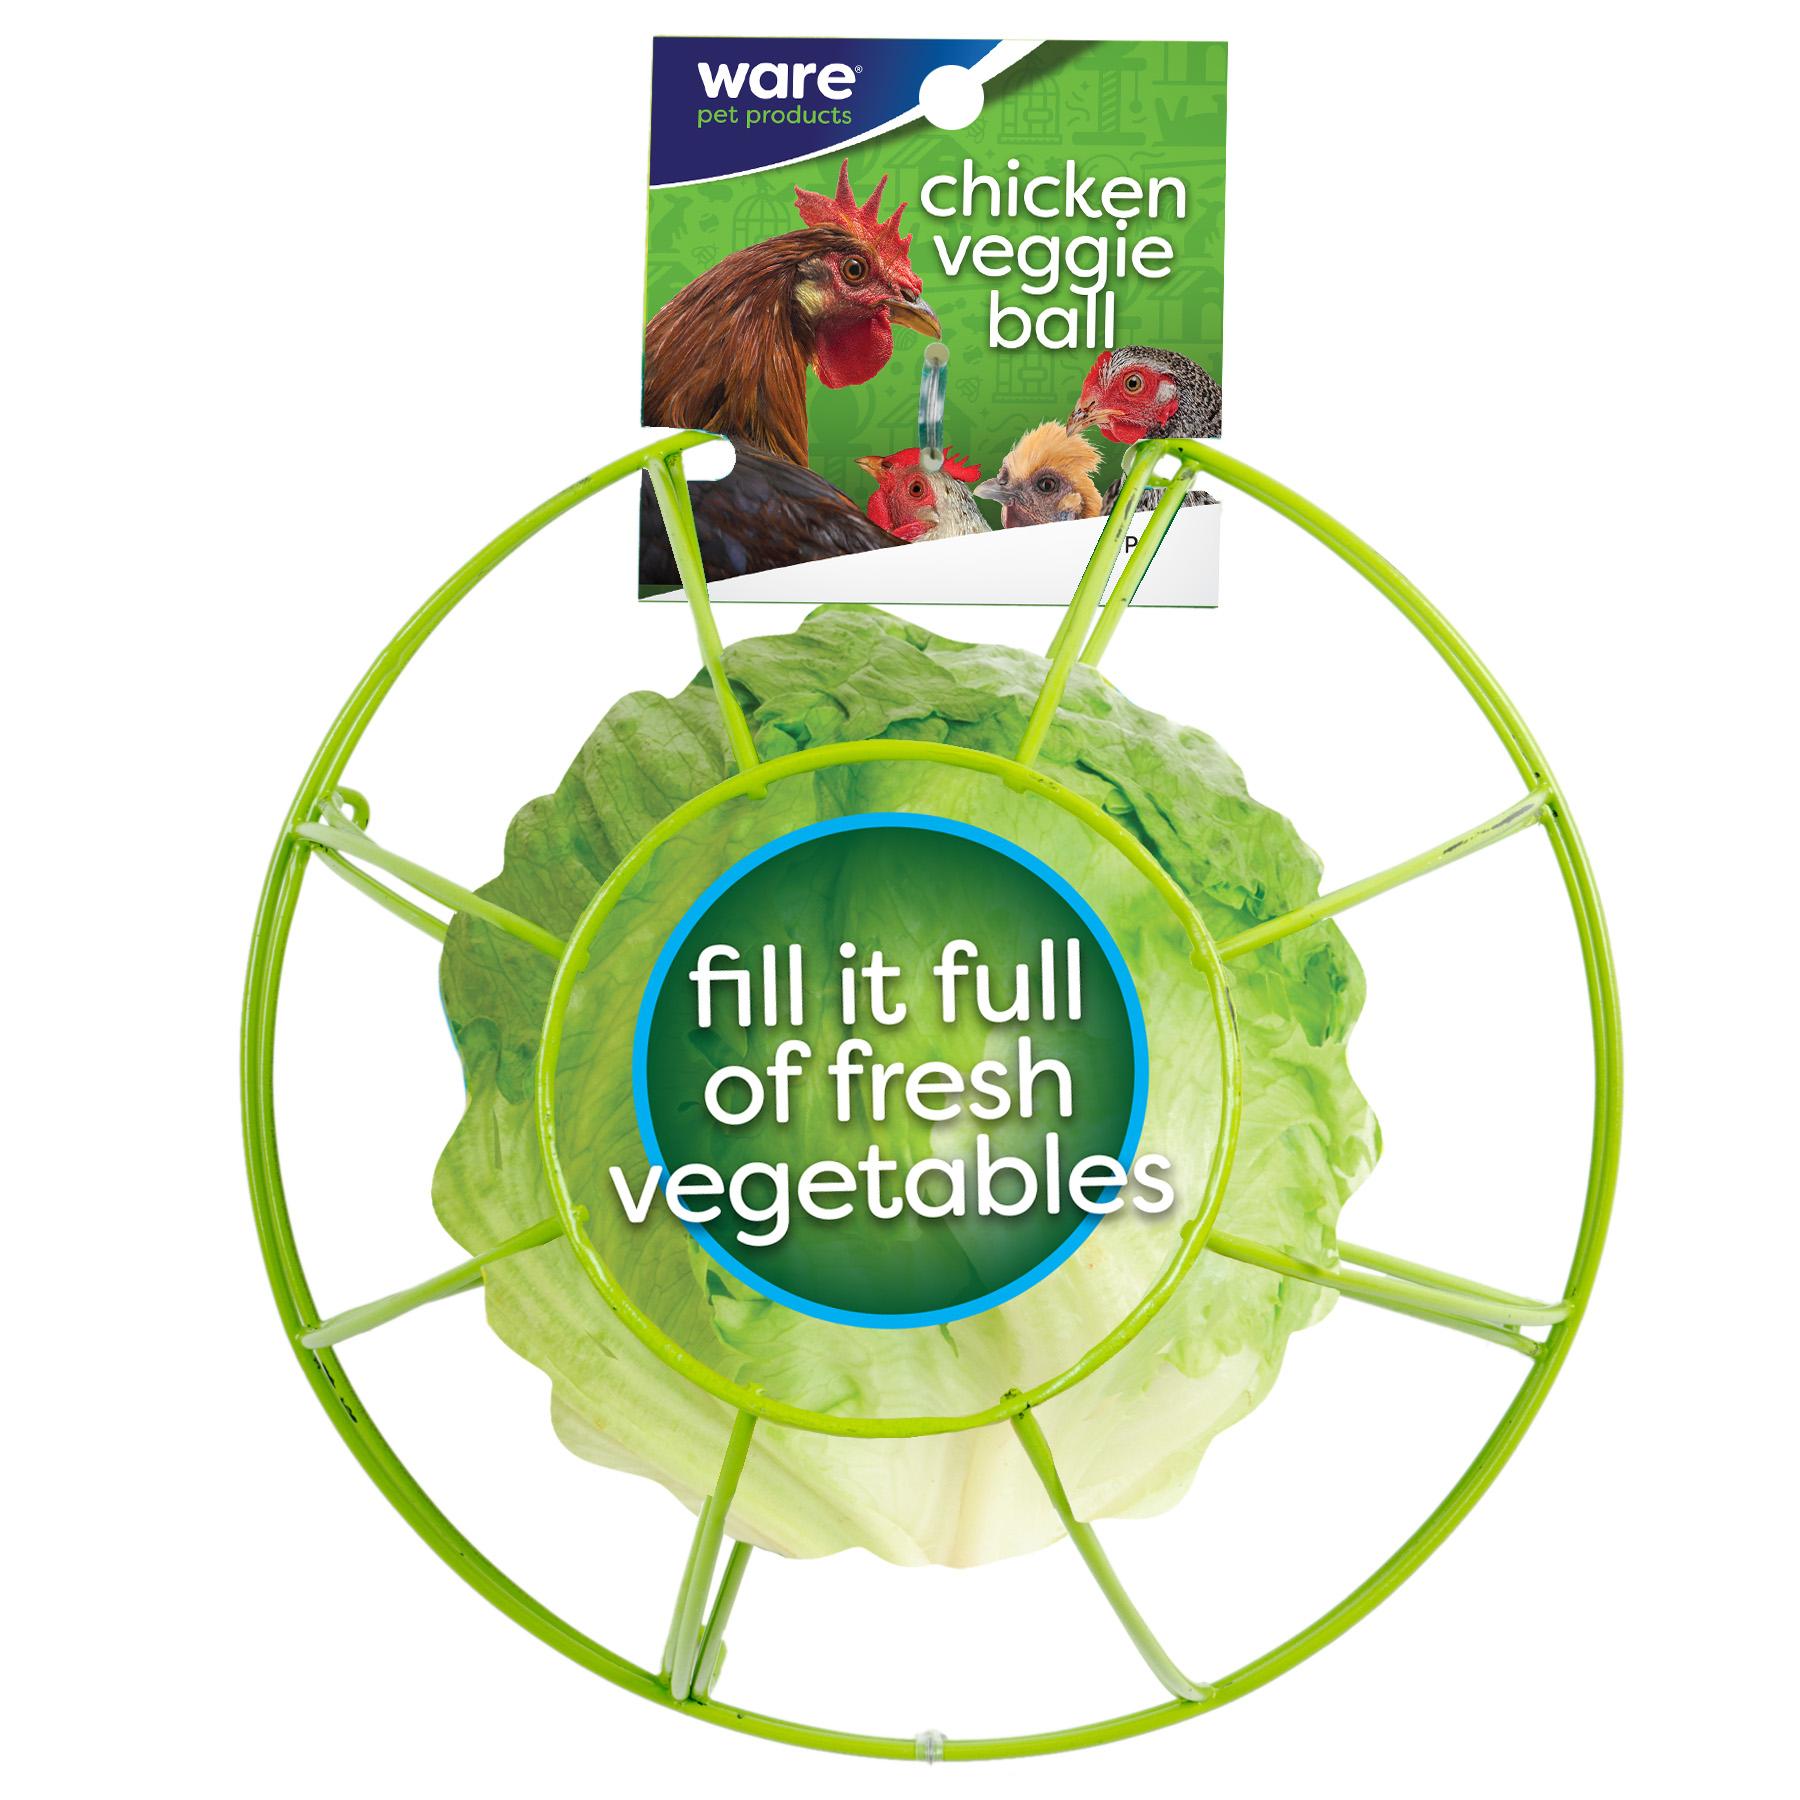 Chick-N-Veggie Ball